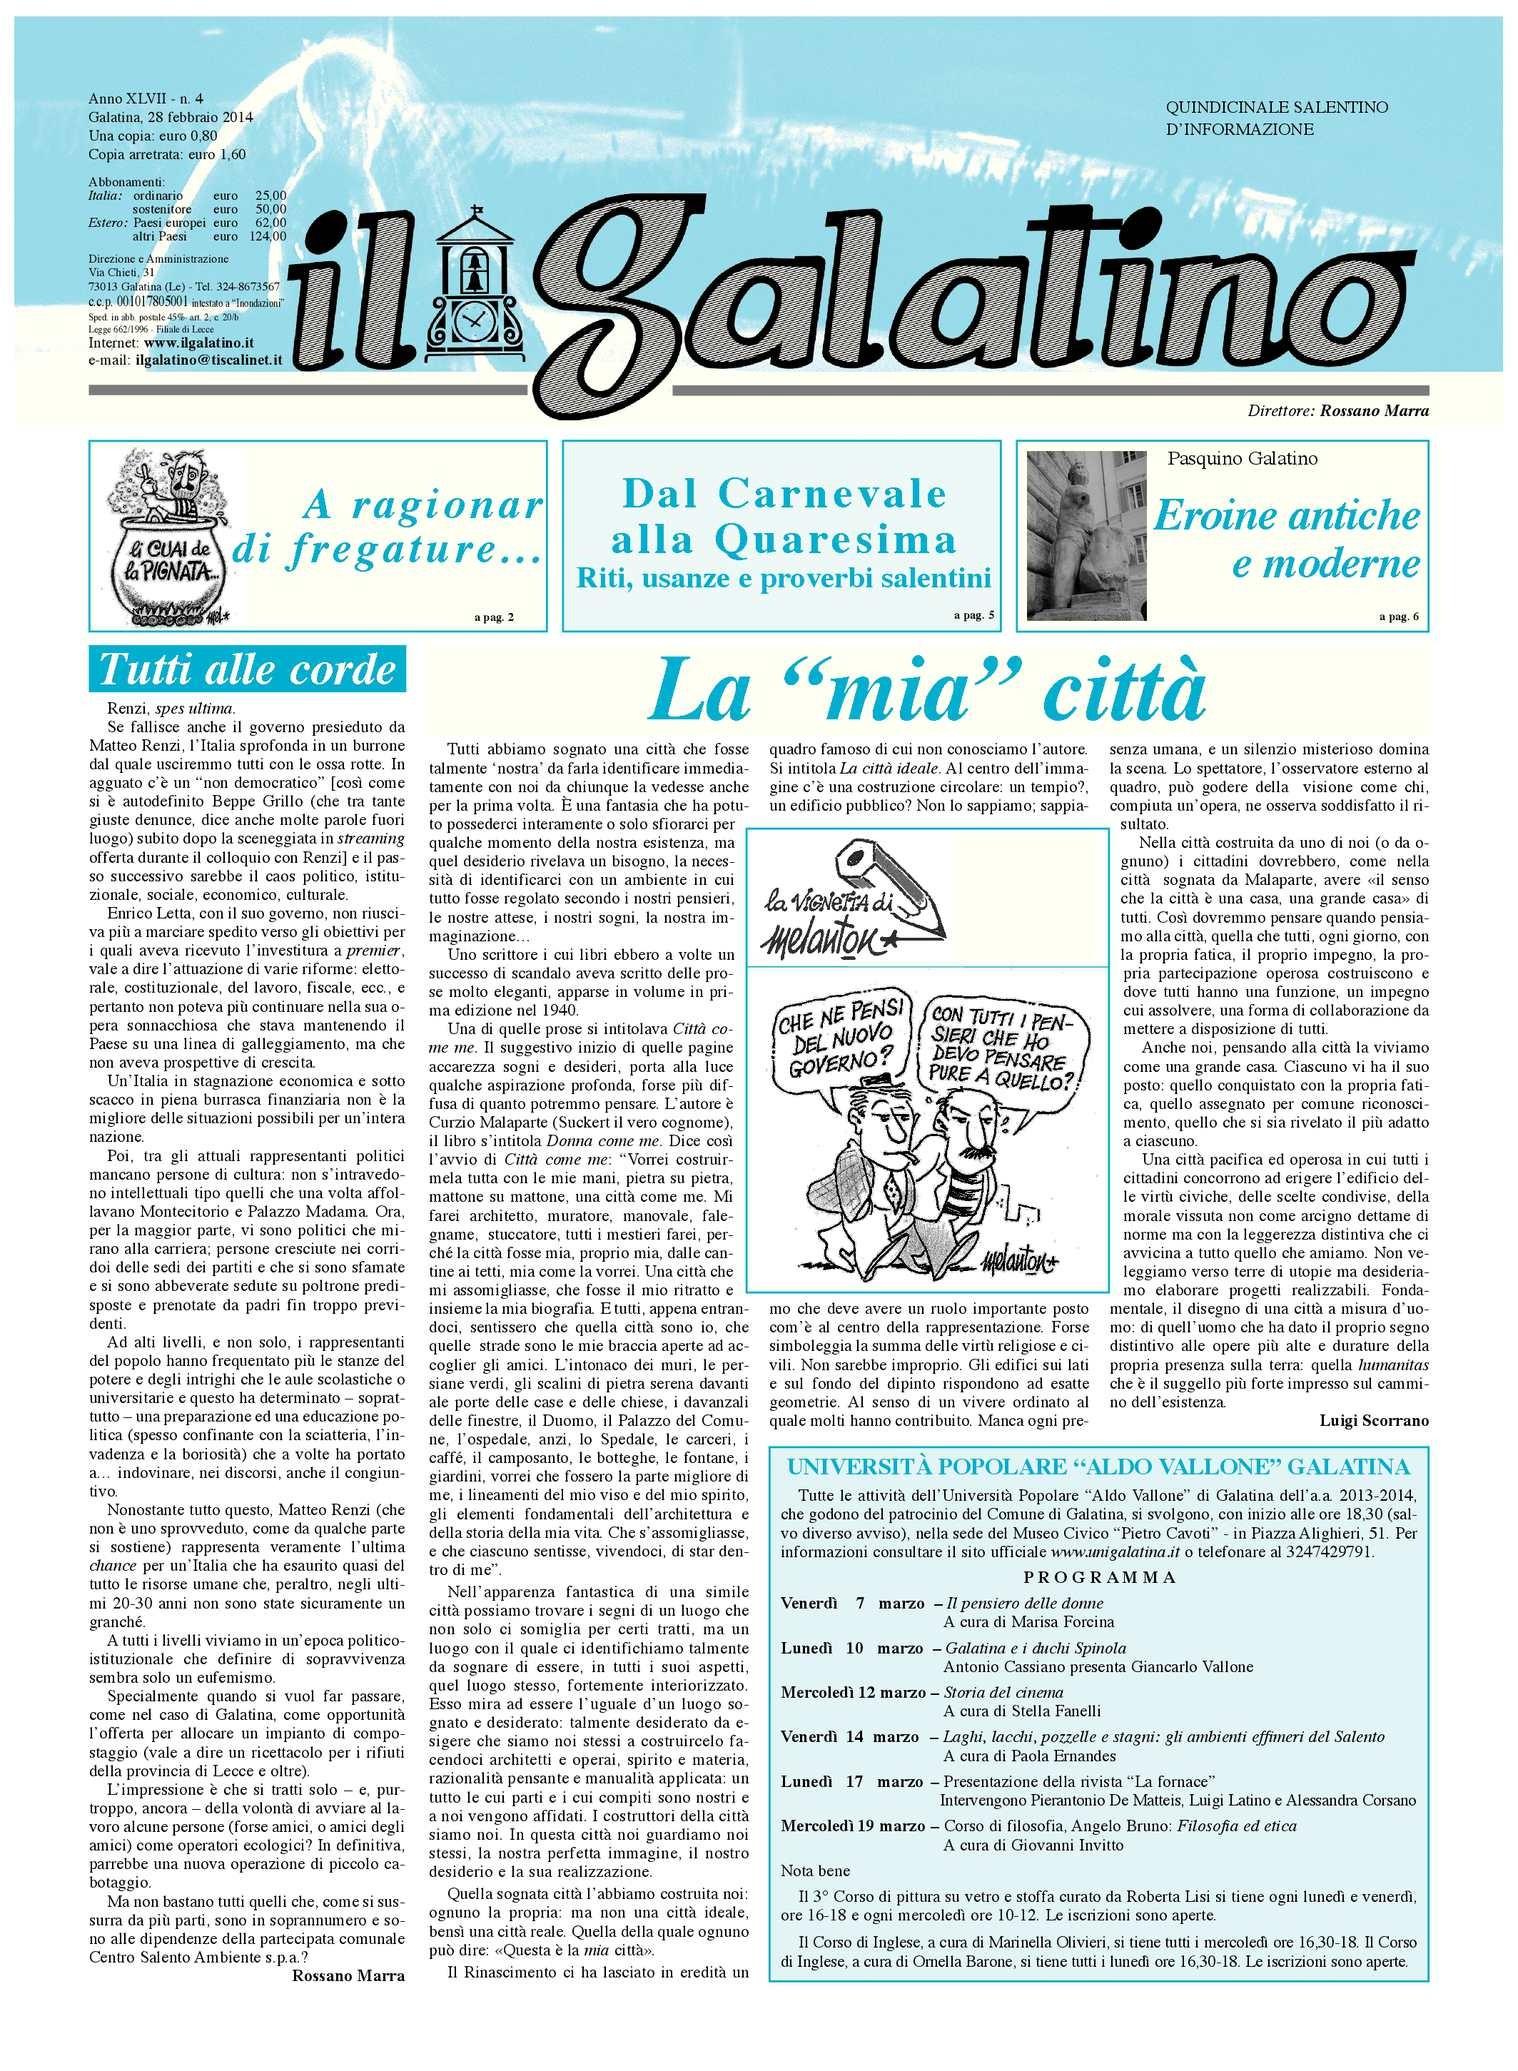 Calendario Olandese 2019 Con Santi Más Reciente Calaméo Il Galatino 4 14 Of Calendario Olandese 2019 Con Santi Más Populares Il Domani by T&p Editori Il Domani issuu